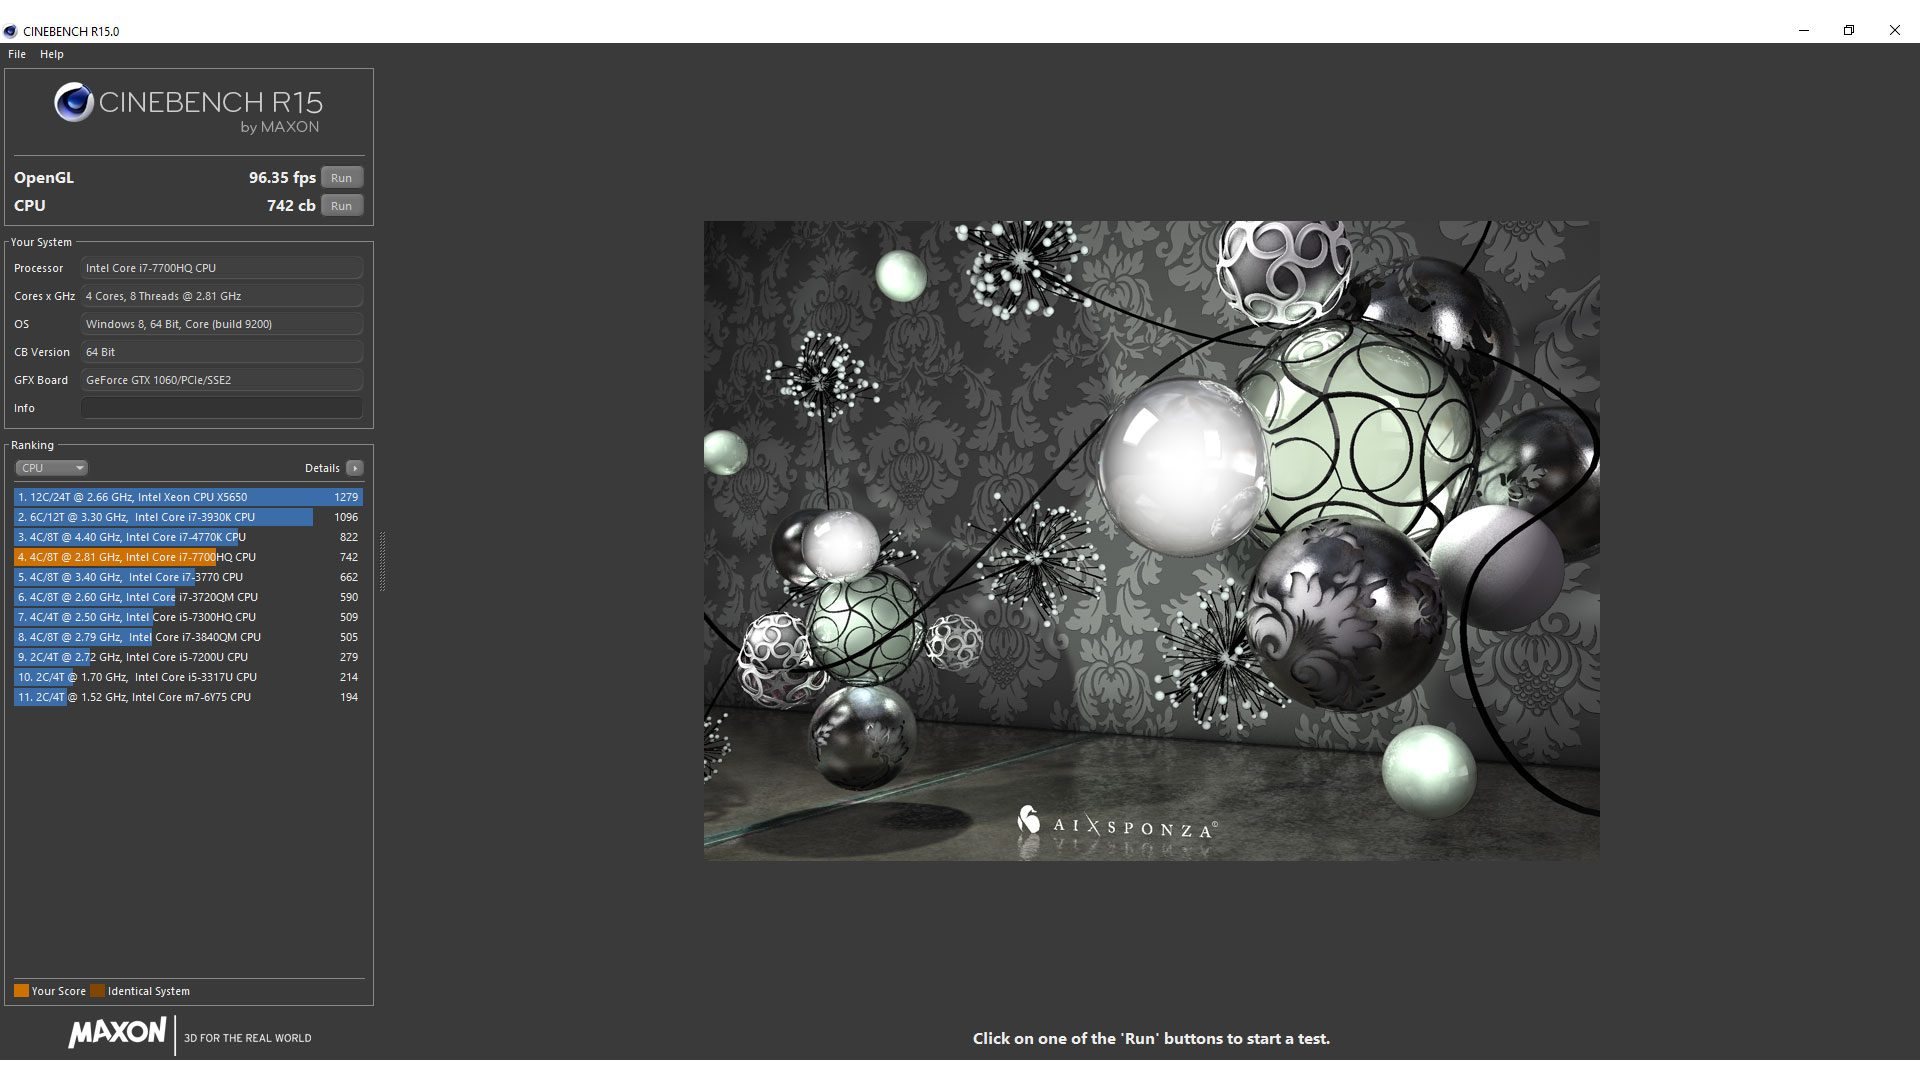 Asus-ROG-Strix-GL702VM-BA323T_Benchmark-8